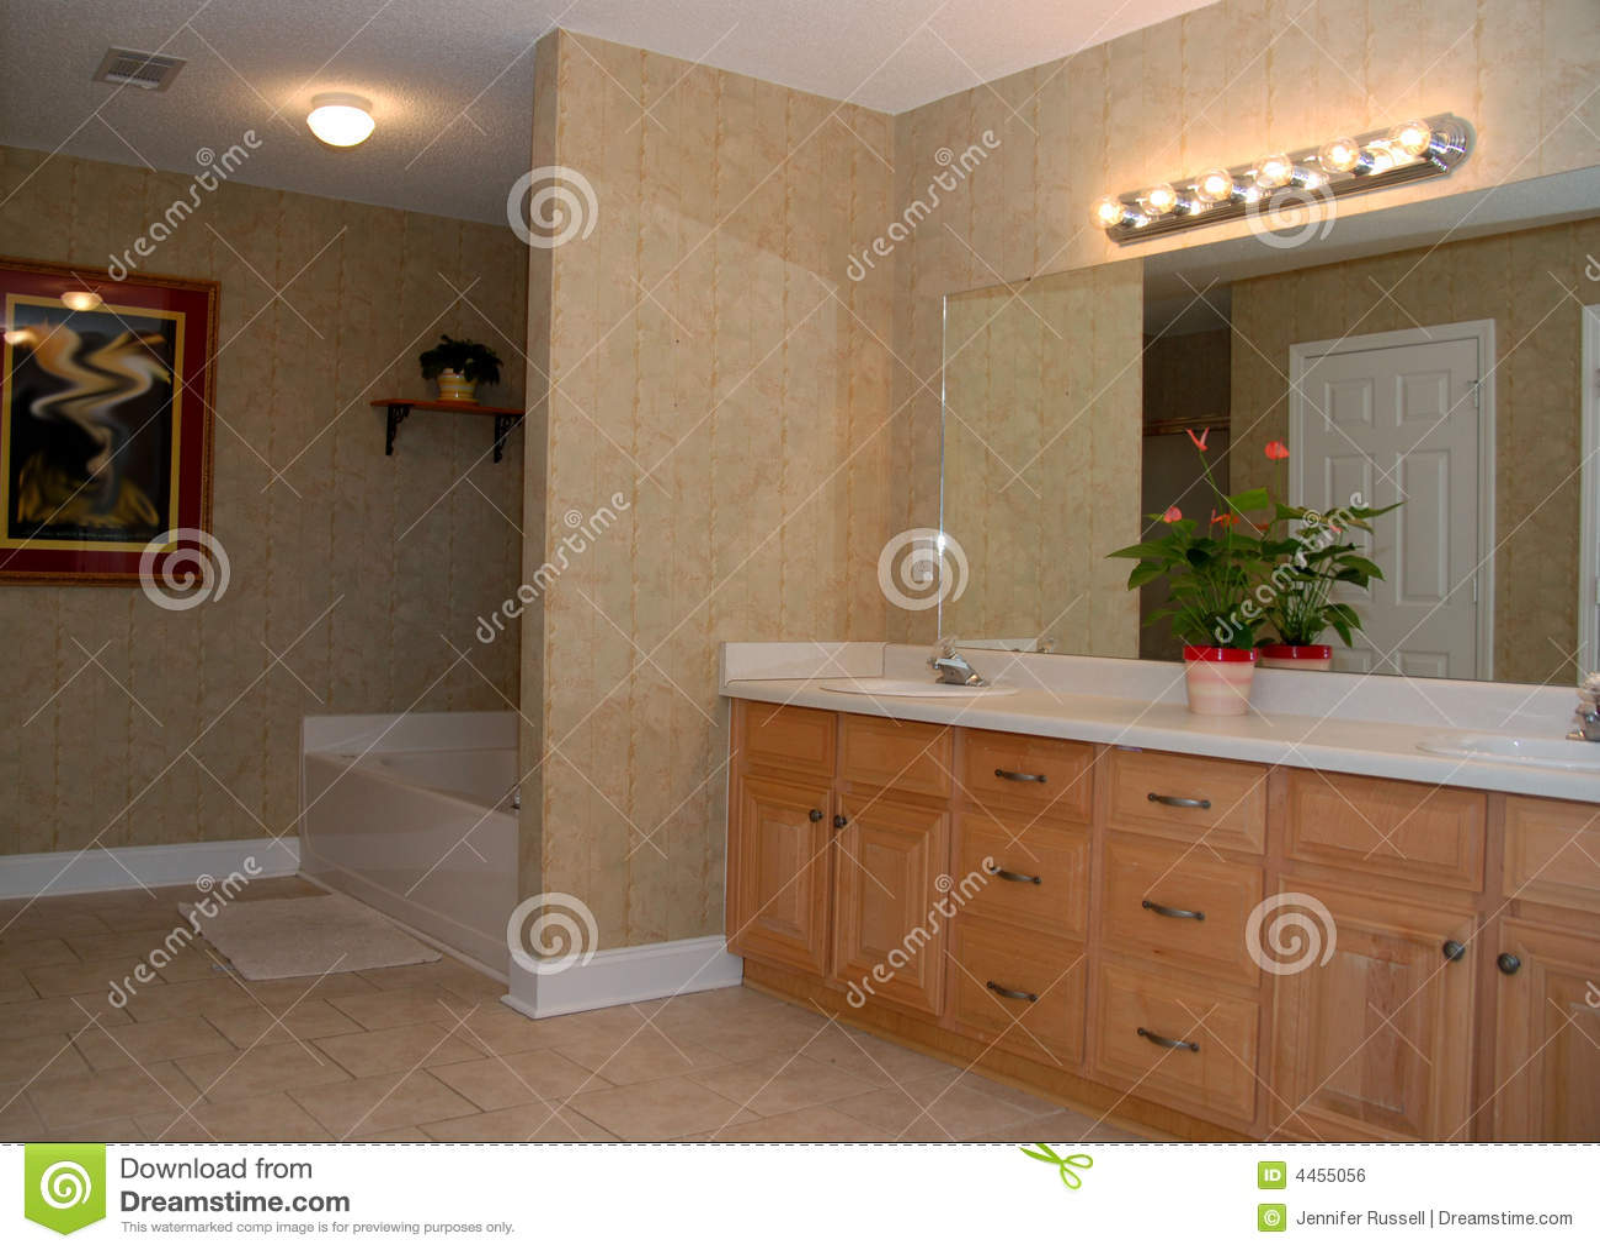 Stanza Da Bagno Elegante Immagine Stock Libera da Diritti - Immagine: 4455056